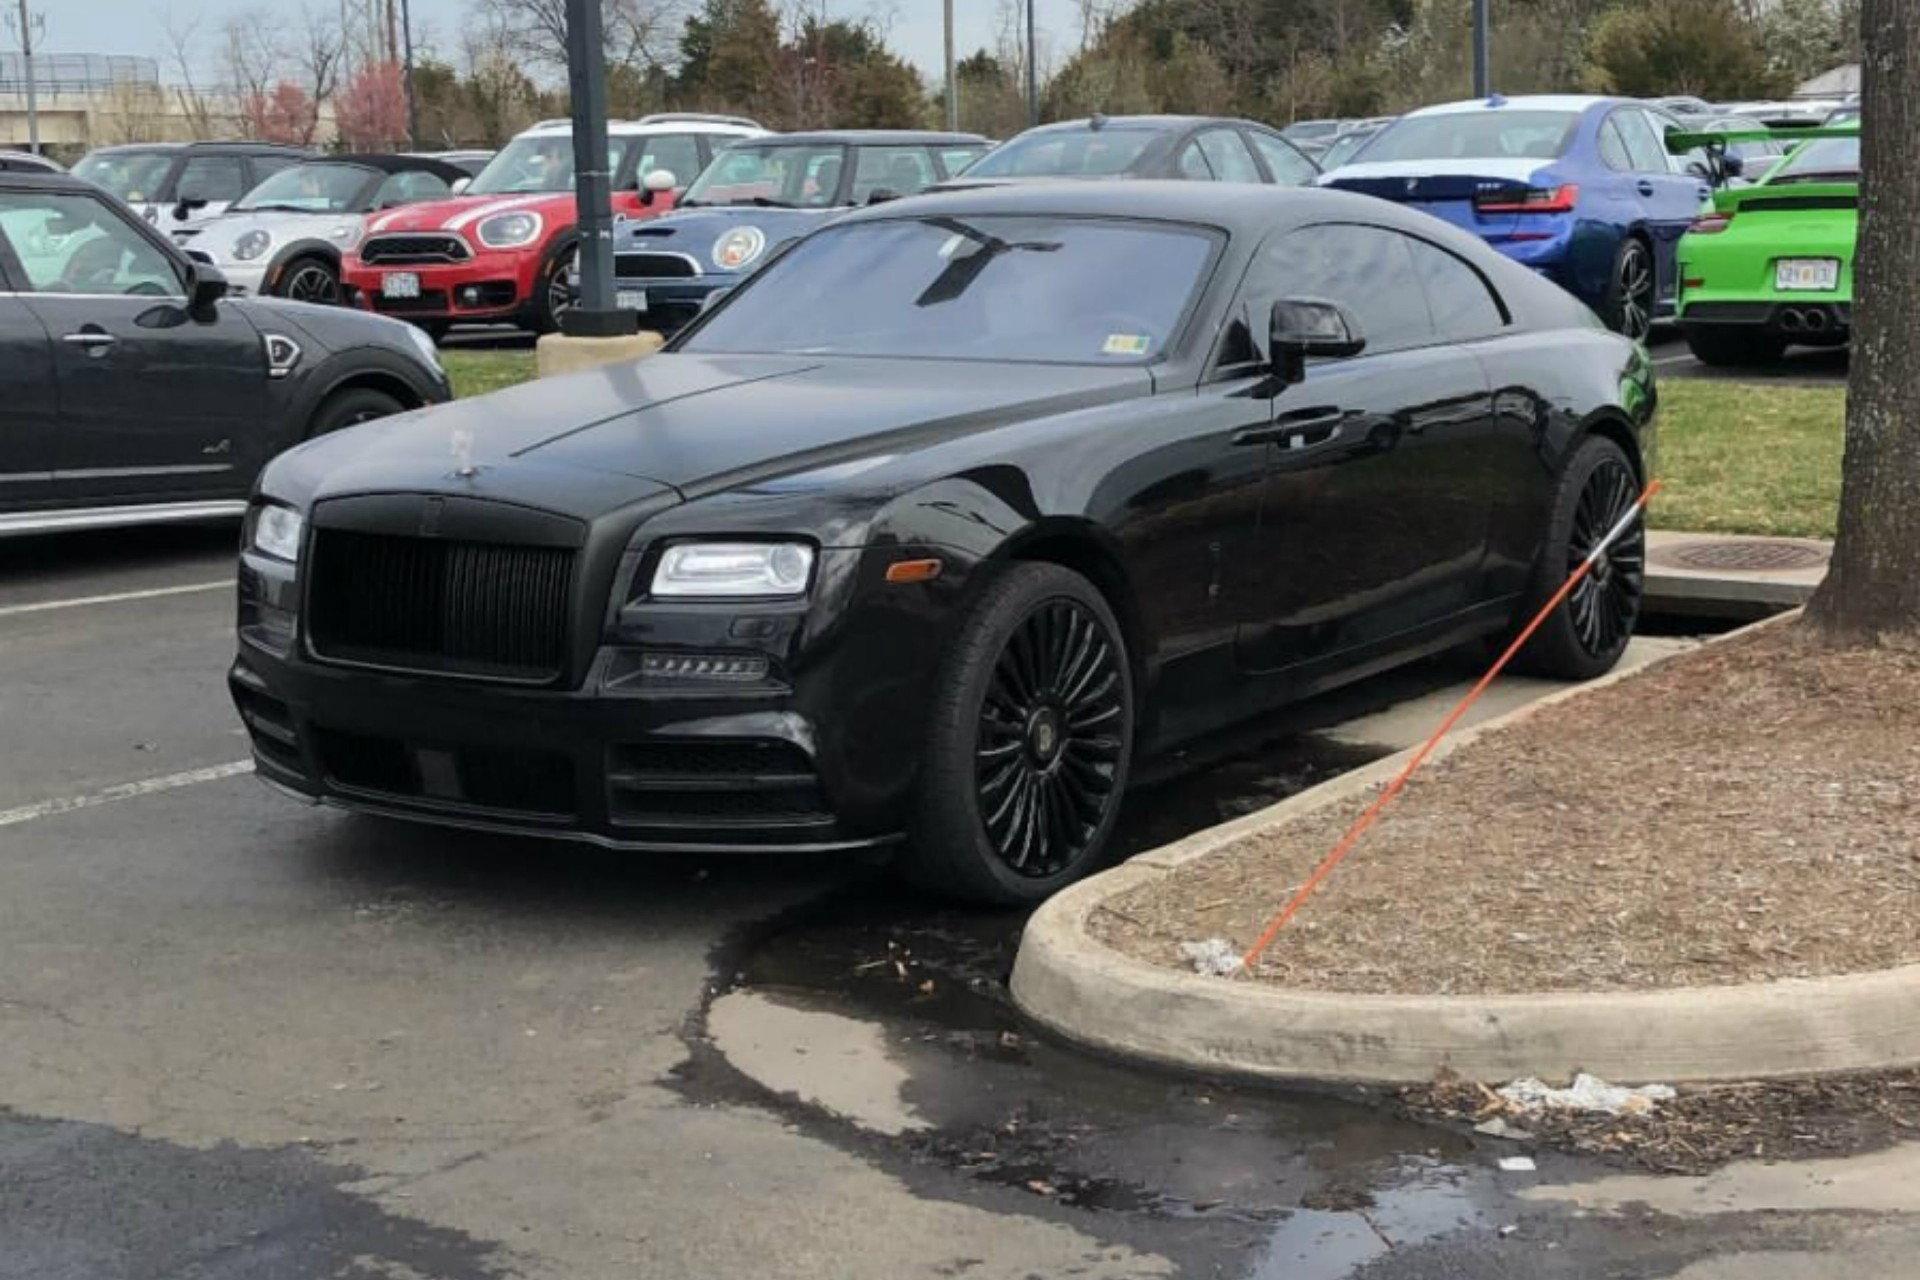 Blacked Out Mansory Rolls Royce Wraith 6speedonline Porsche Forum And Luxury Car Resource